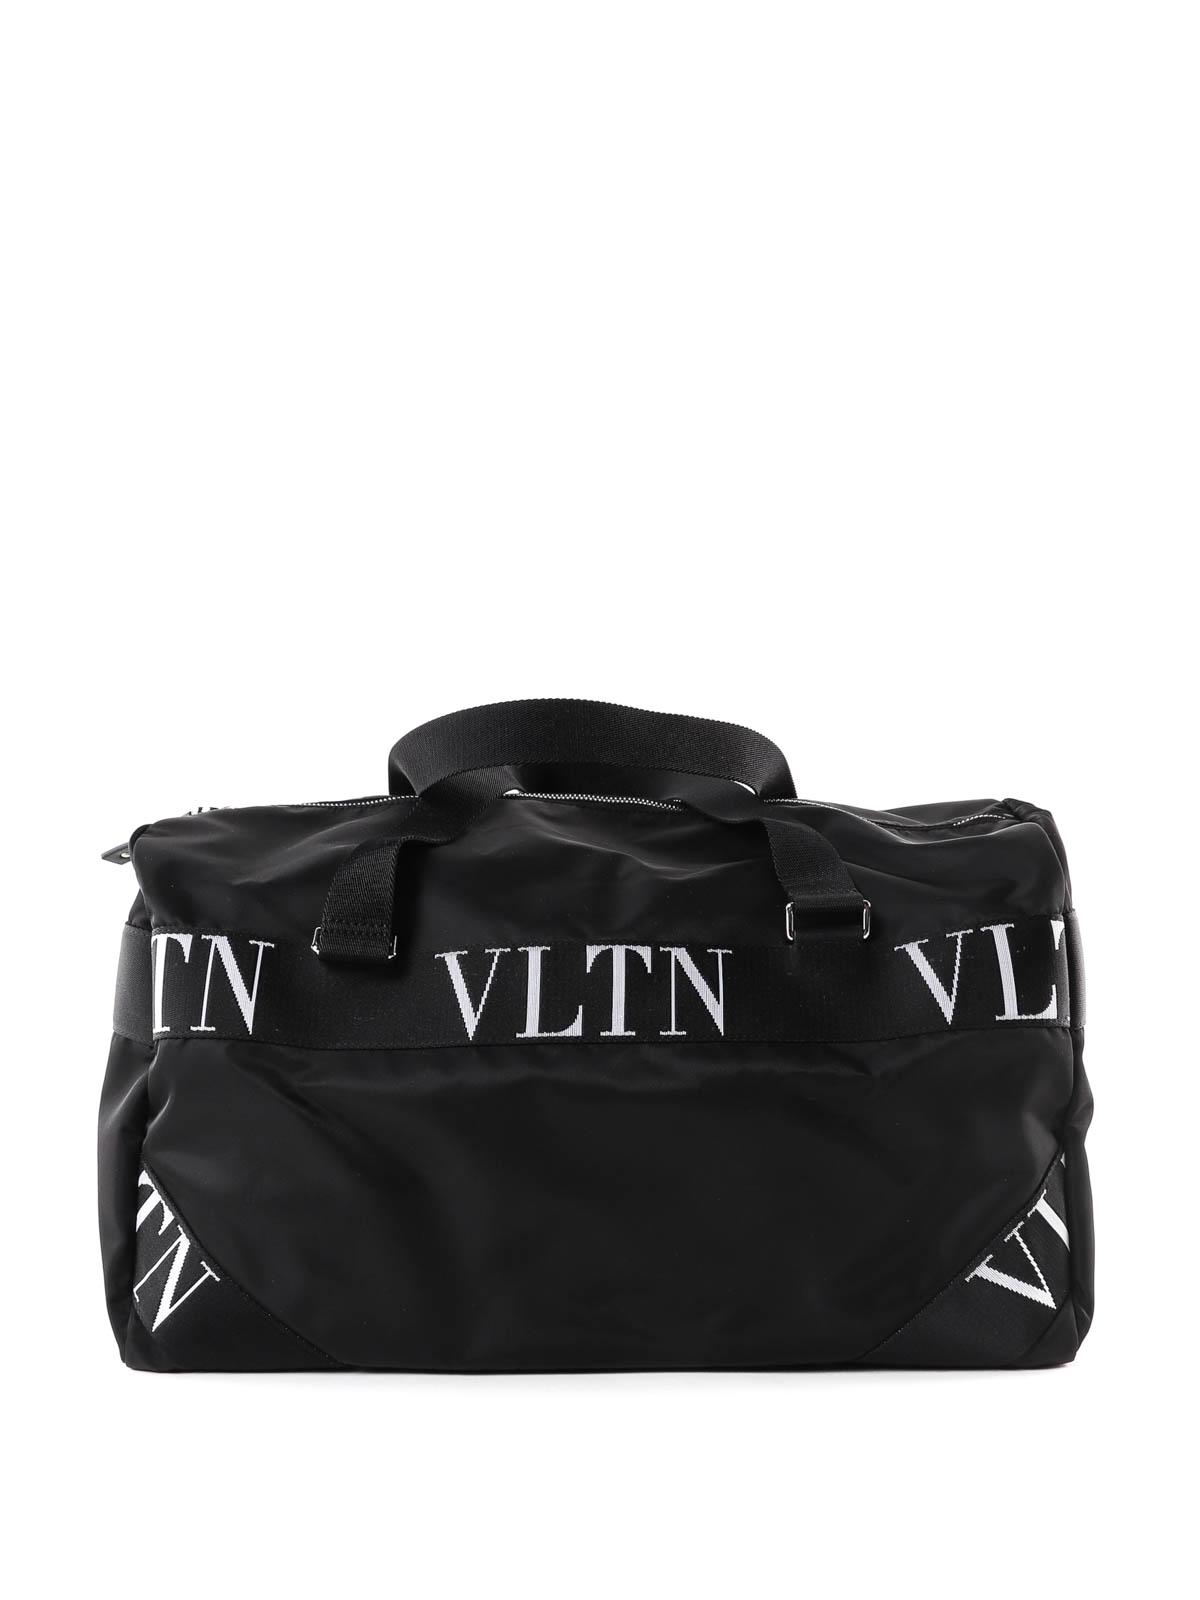 Vltn Sacsamp; Valises Valentino Garavani De Voyage Sac Yb7vgyf6